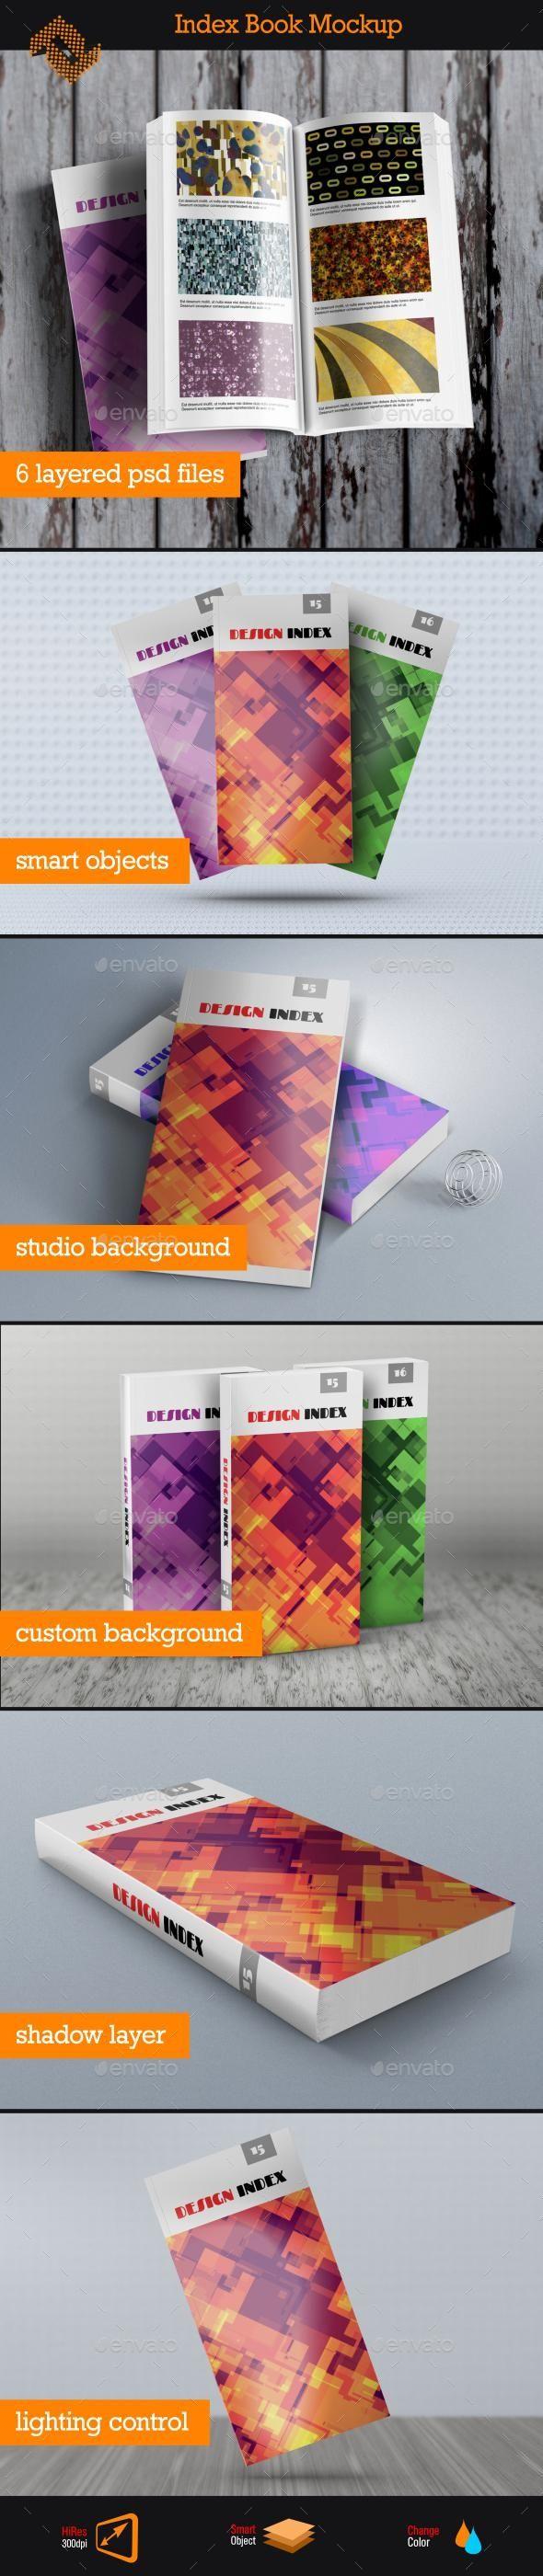 Index Book Mockup Print Mockup Graphic Design Book Cover Business Card Mock Up